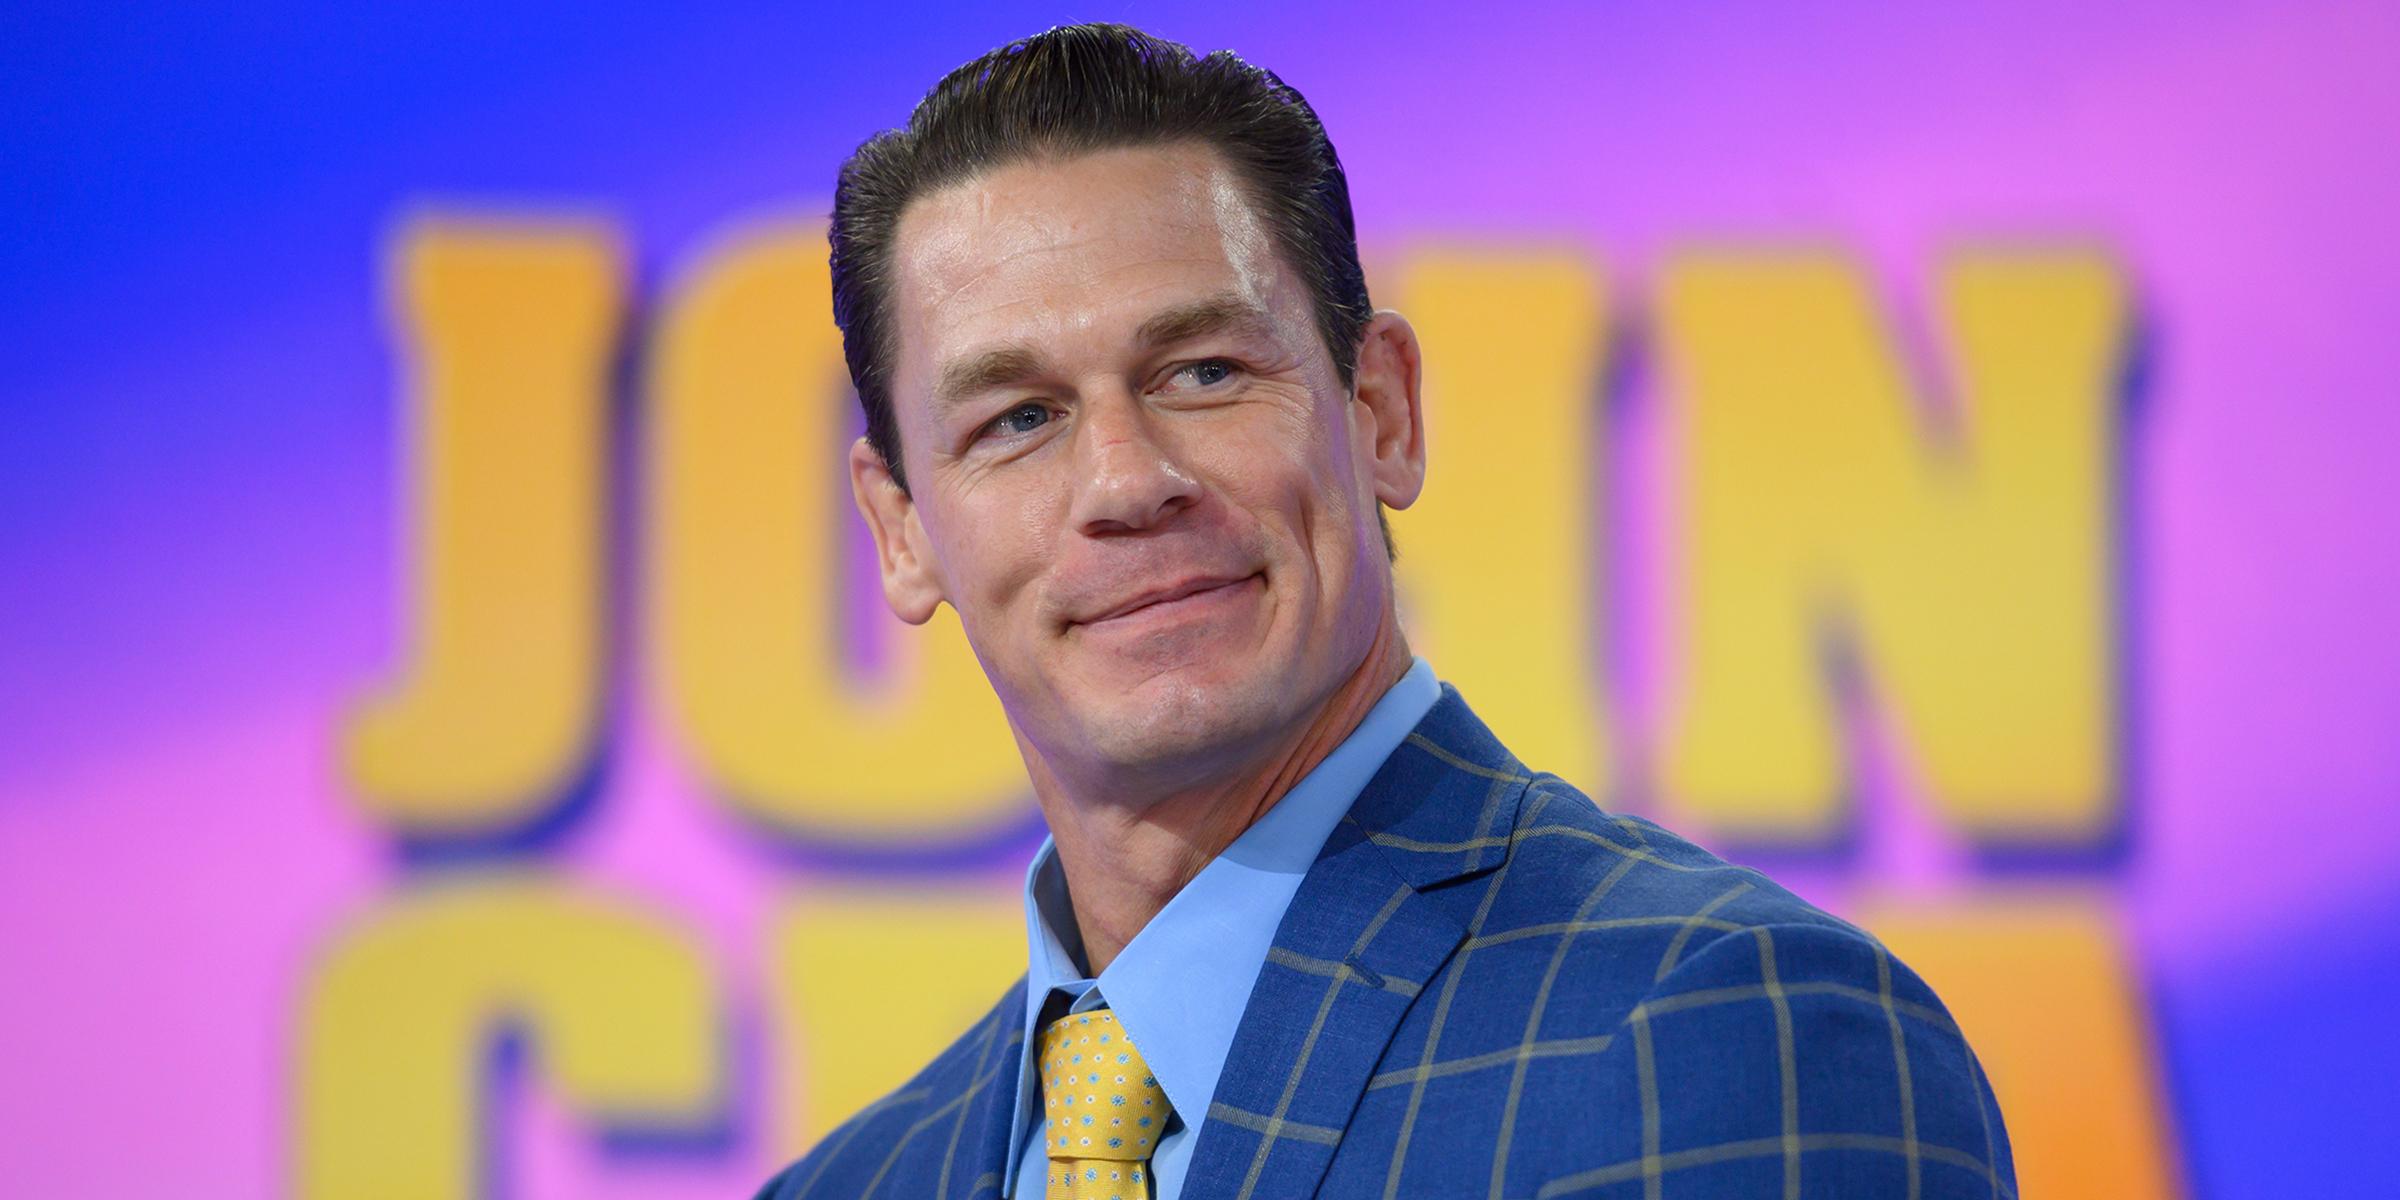 John Cena: 'I'm extremely happy' in my new relationship